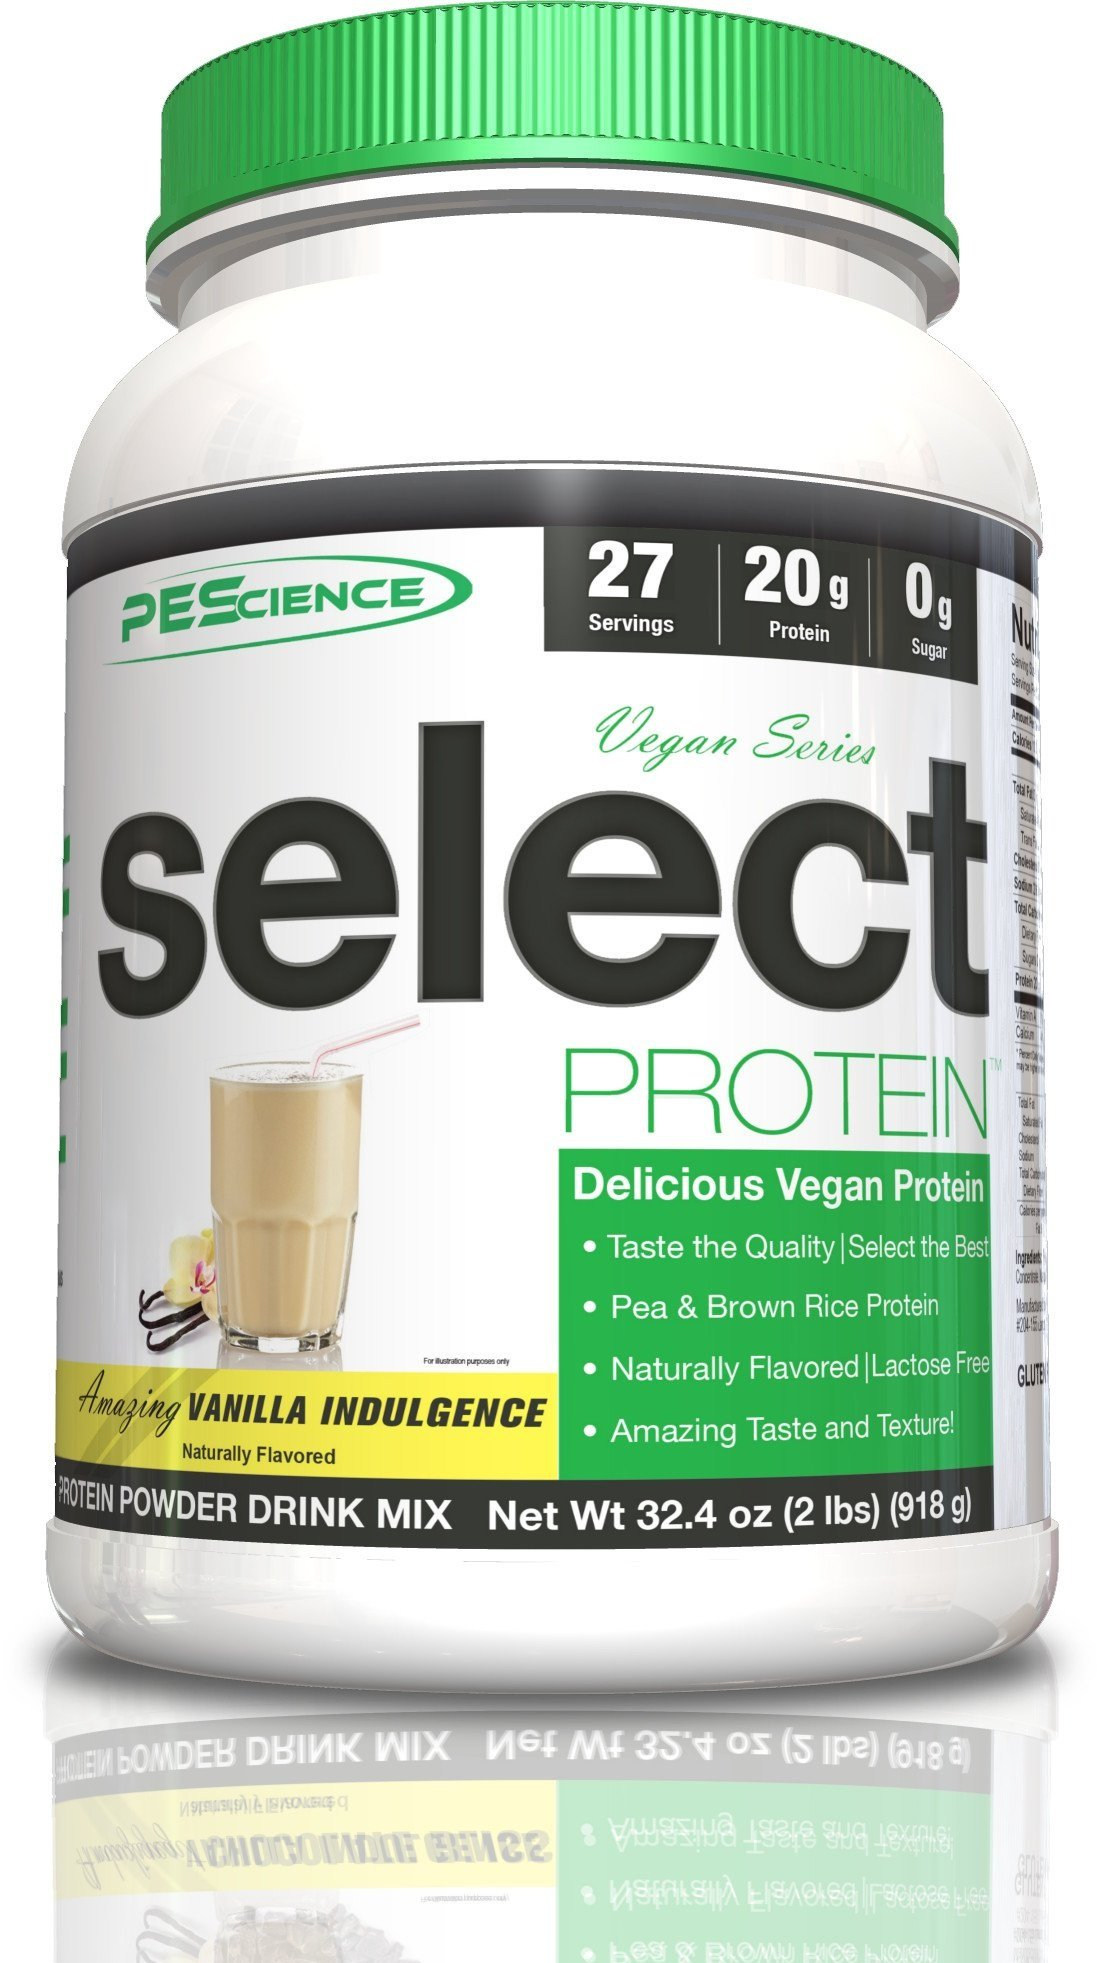 PEScience Select Vegan Protein - Vanilla Indulgence (27 servings)